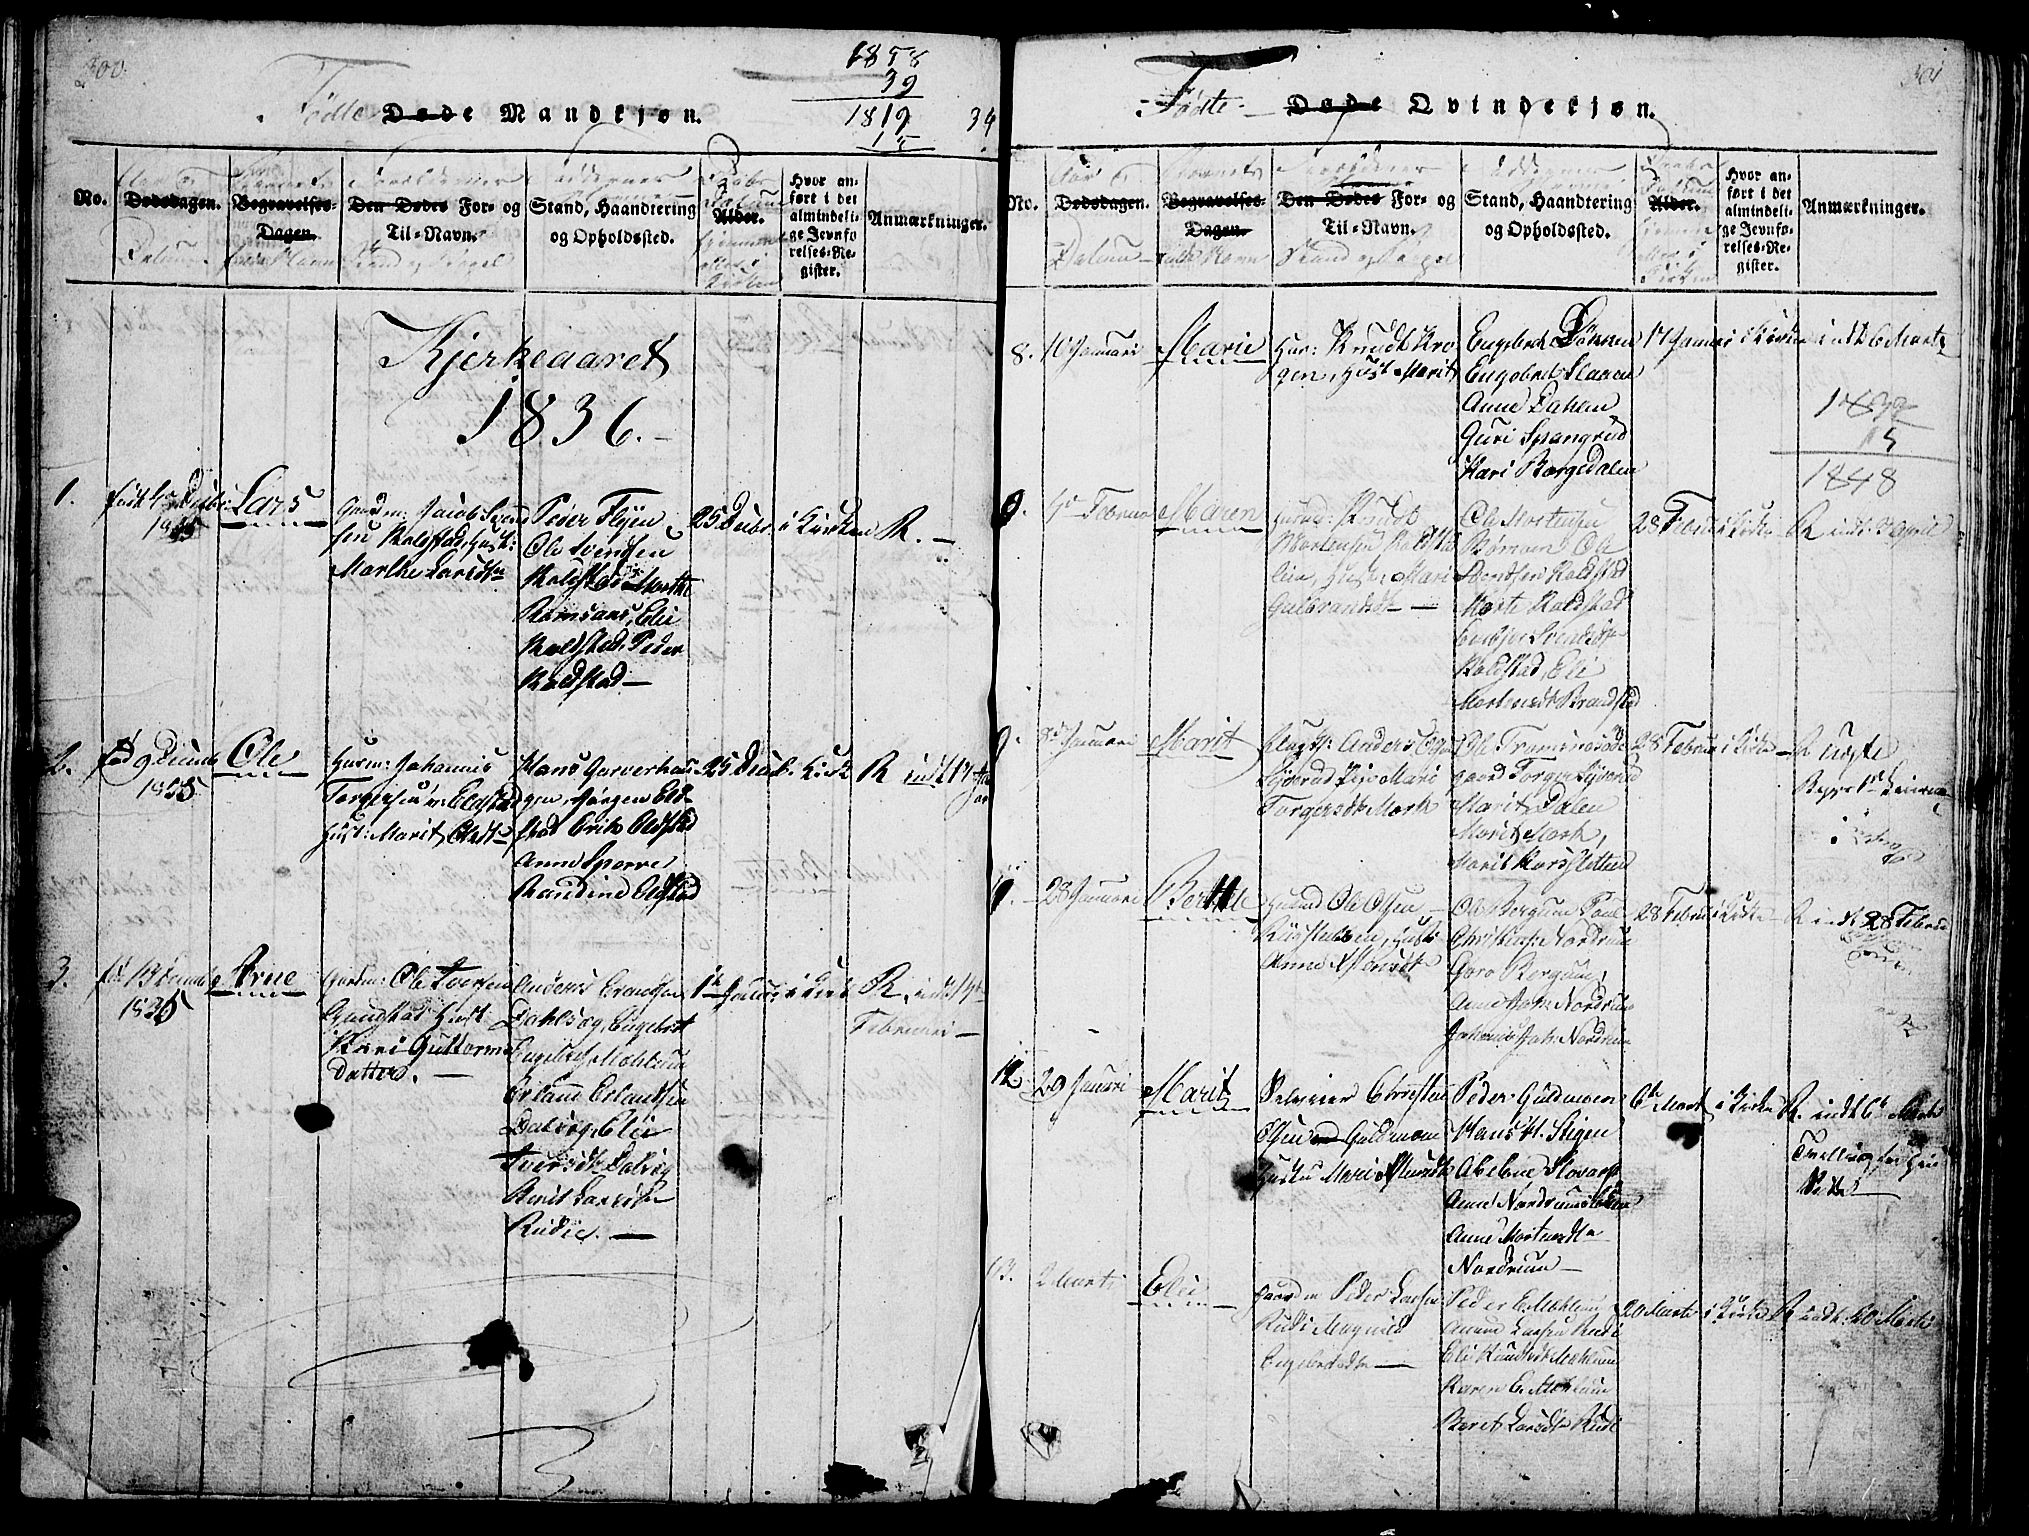 SAH, Ringebu prestekontor, Klokkerbok nr. 1, 1821-1839, s. 300-301